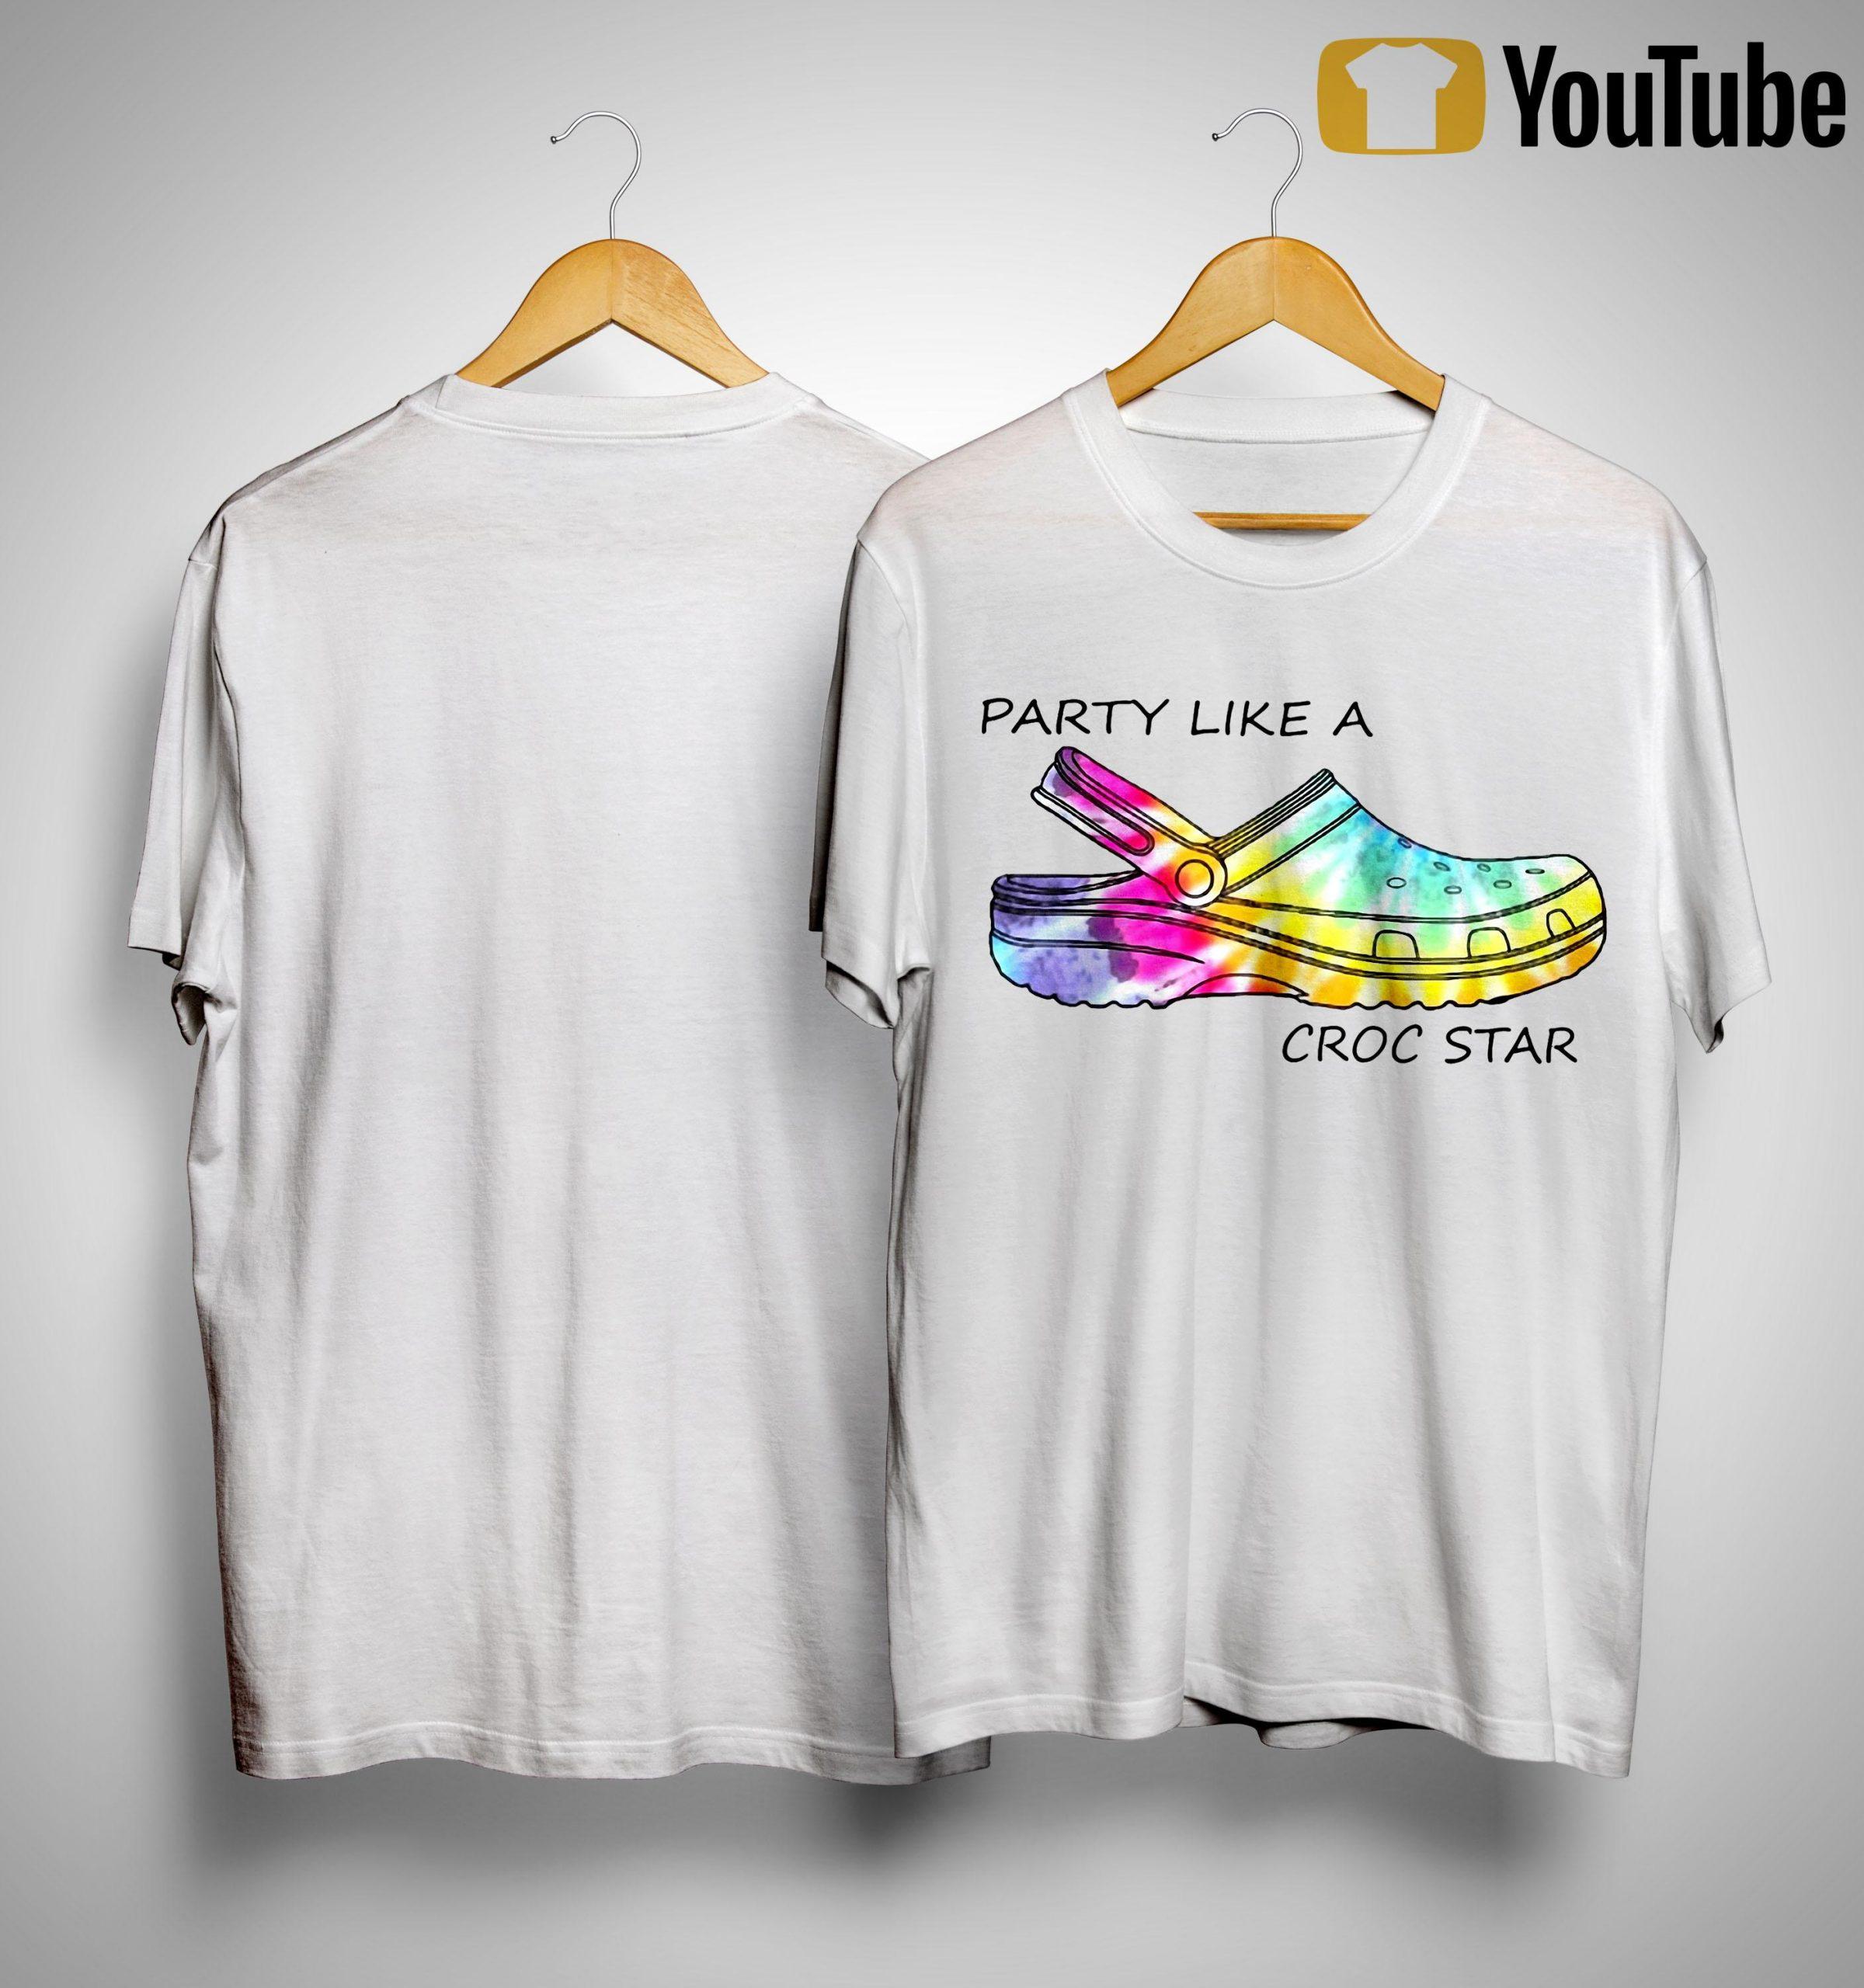 Tie Dye Party Like A Croc Star Shirt